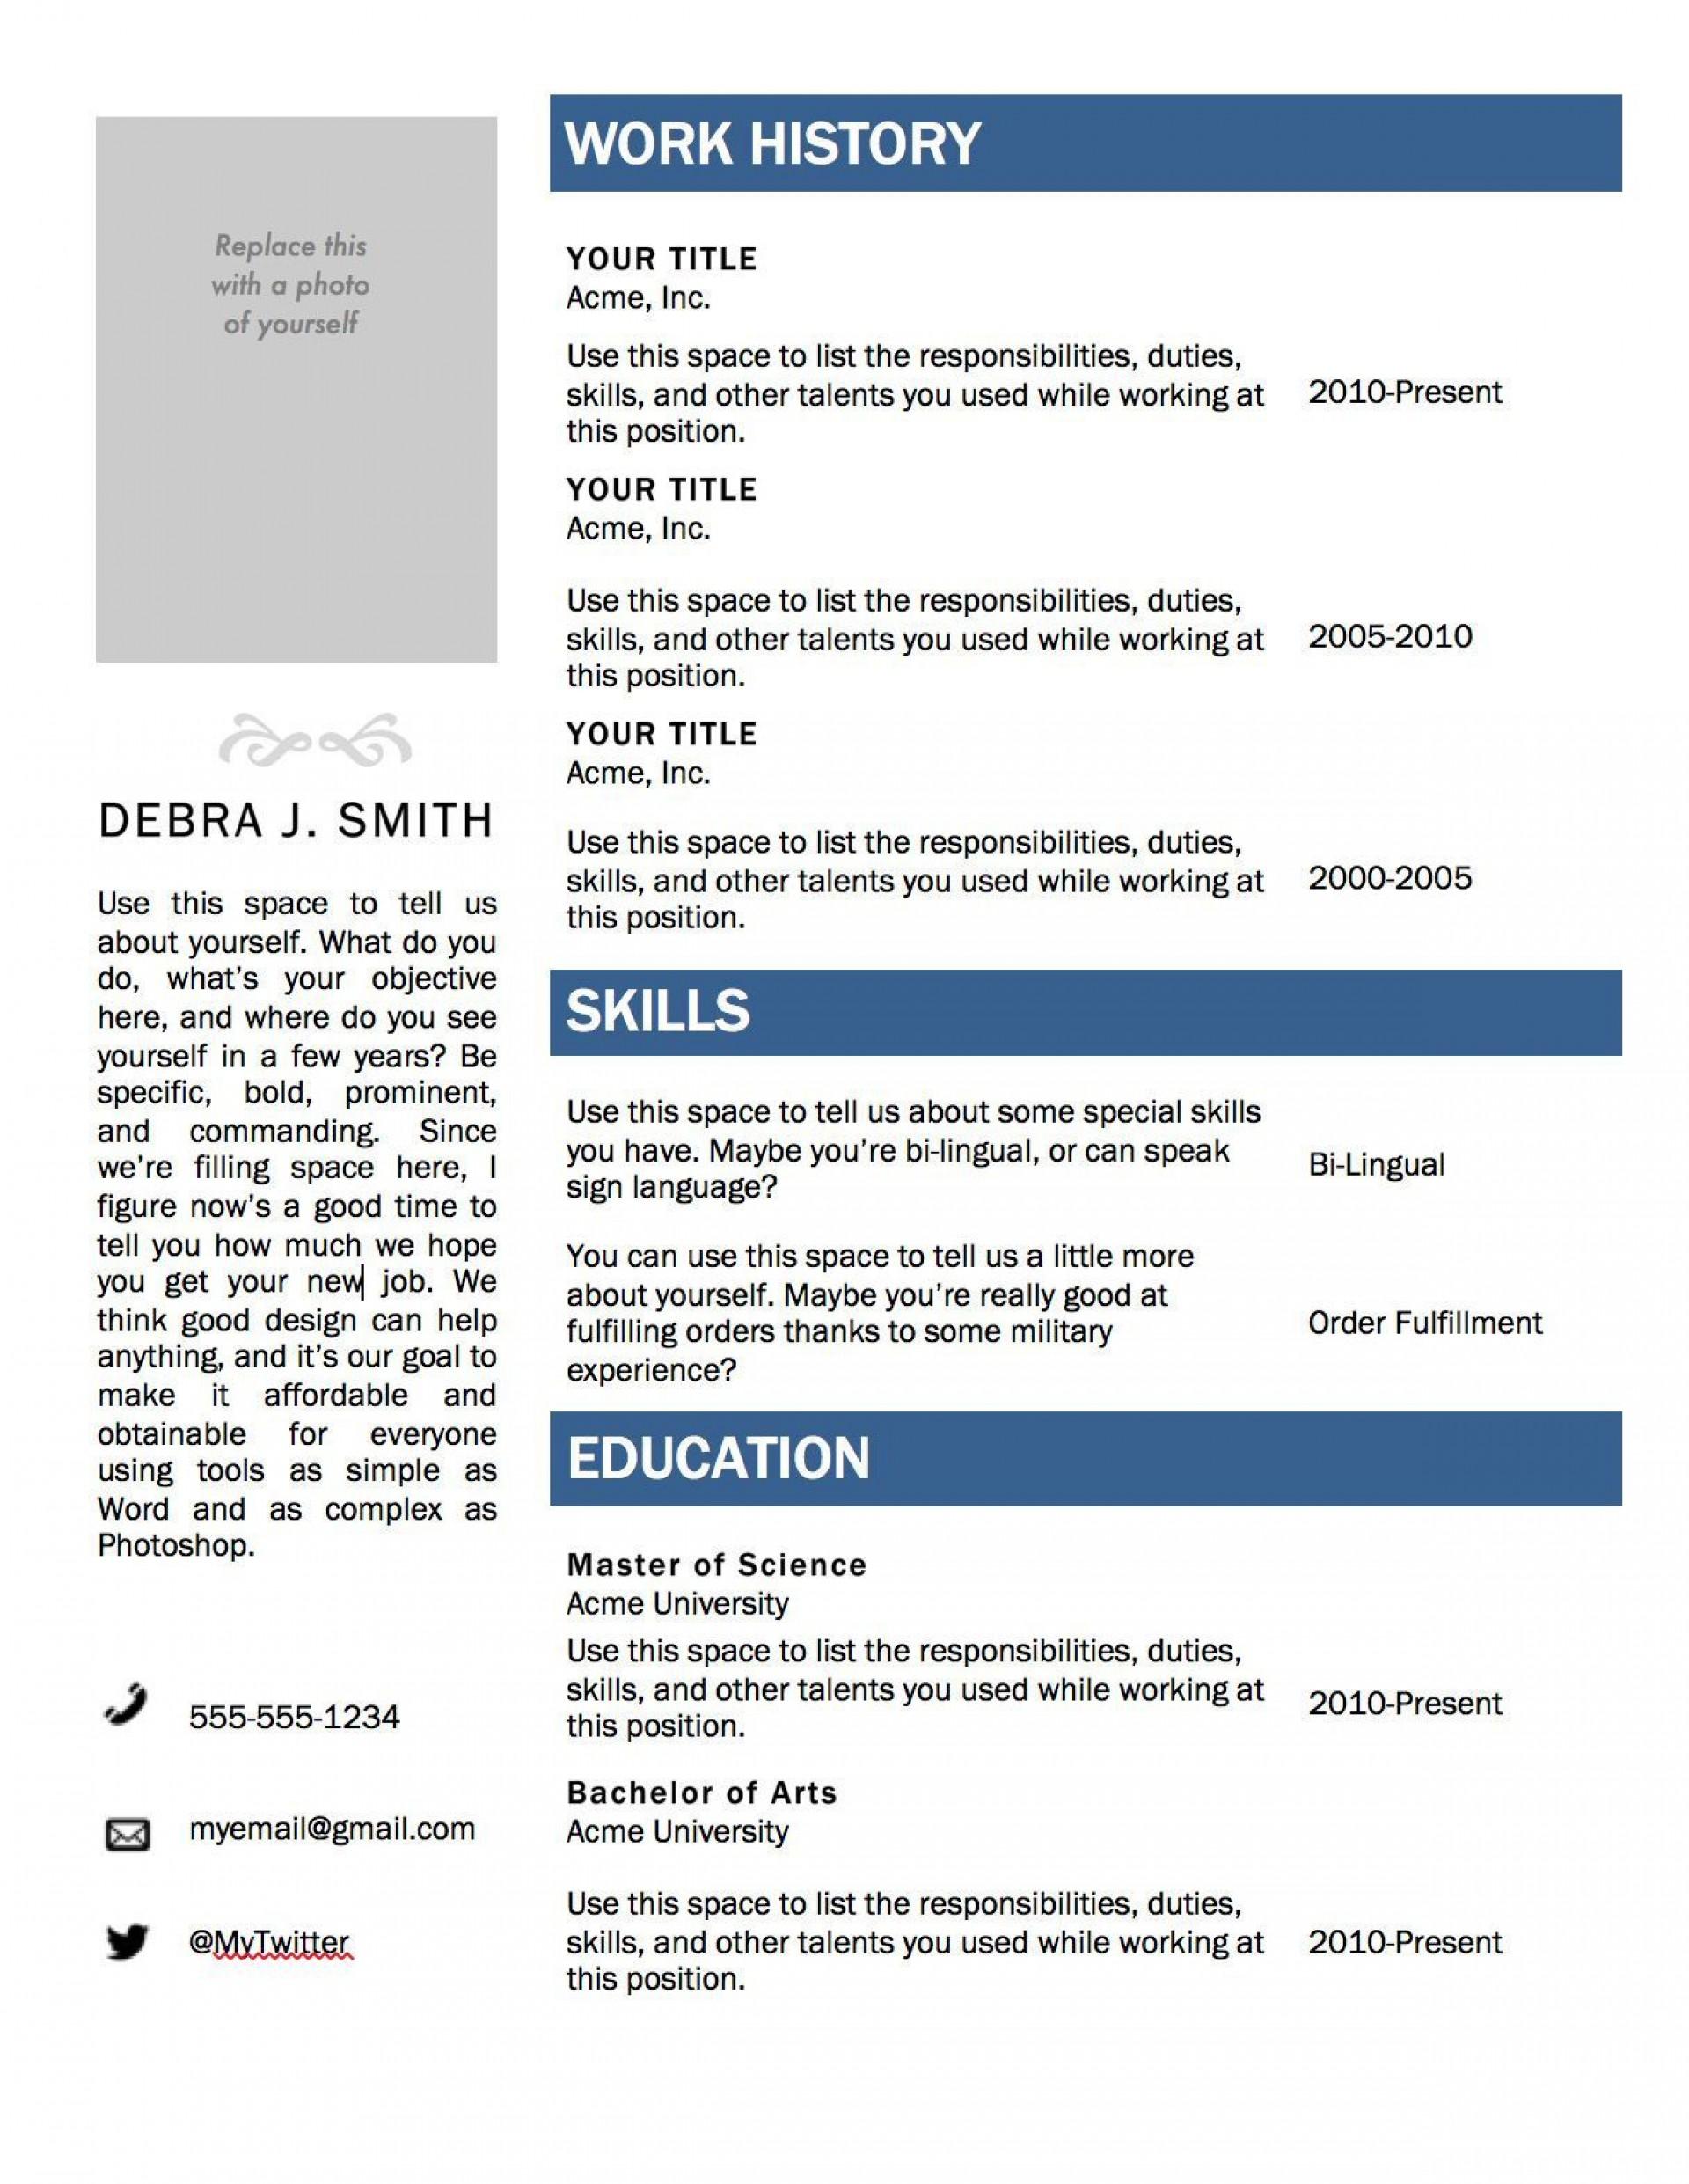 001 Impressive Resume Template On Microsoft Word Image  Sample 2007 Cv 20101920